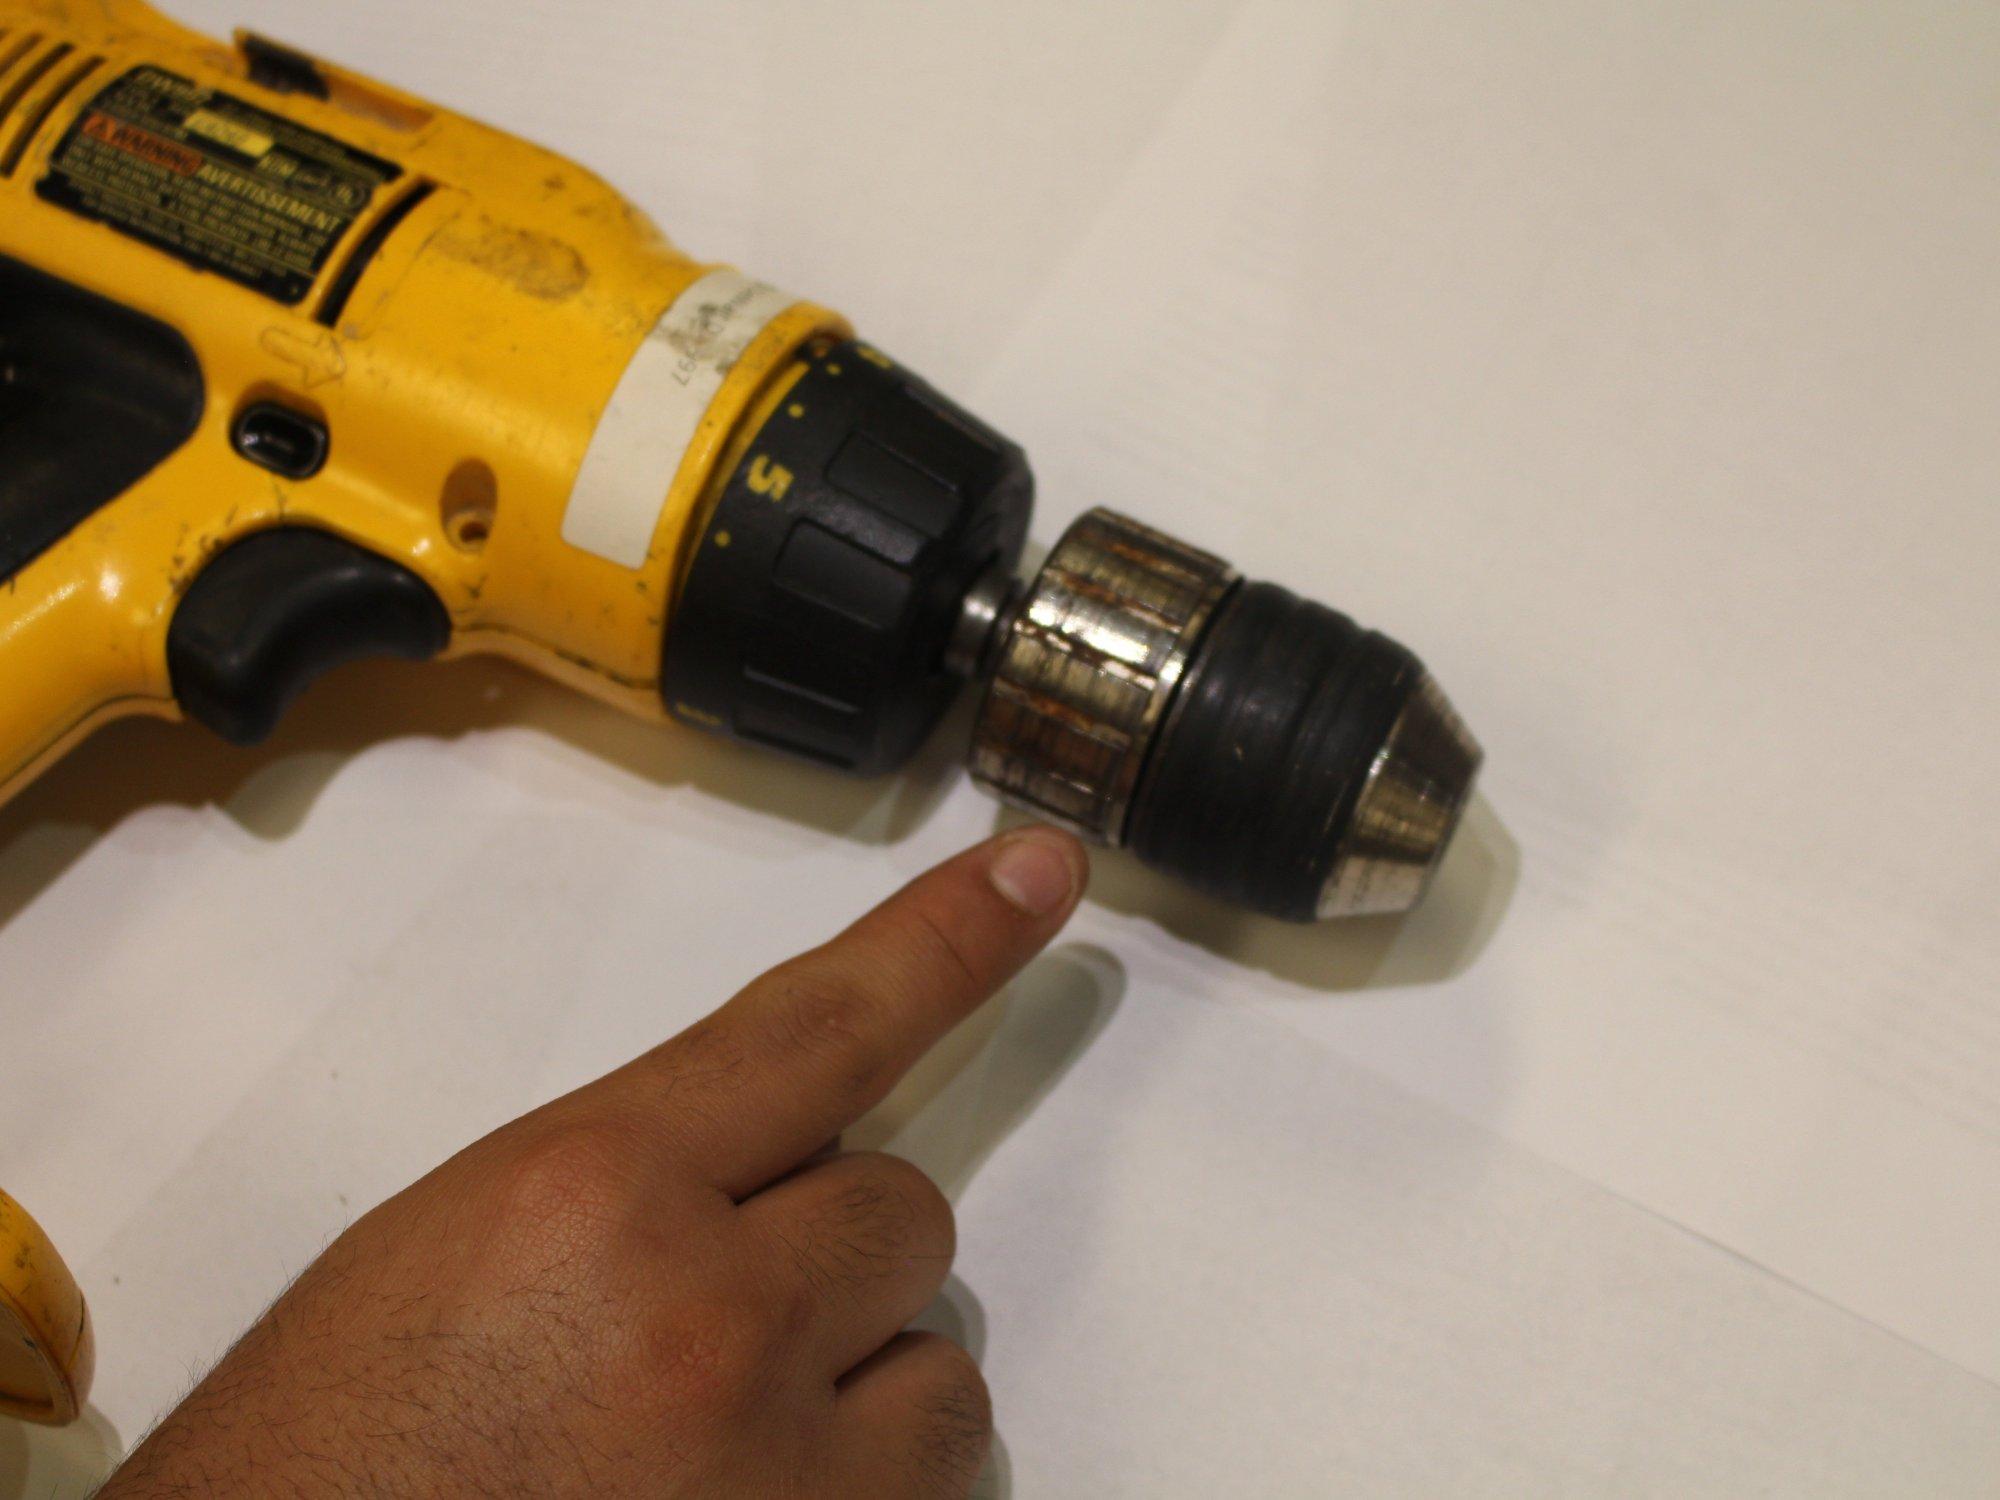 hight resolution of dewalt dw997 drill chuck replacement